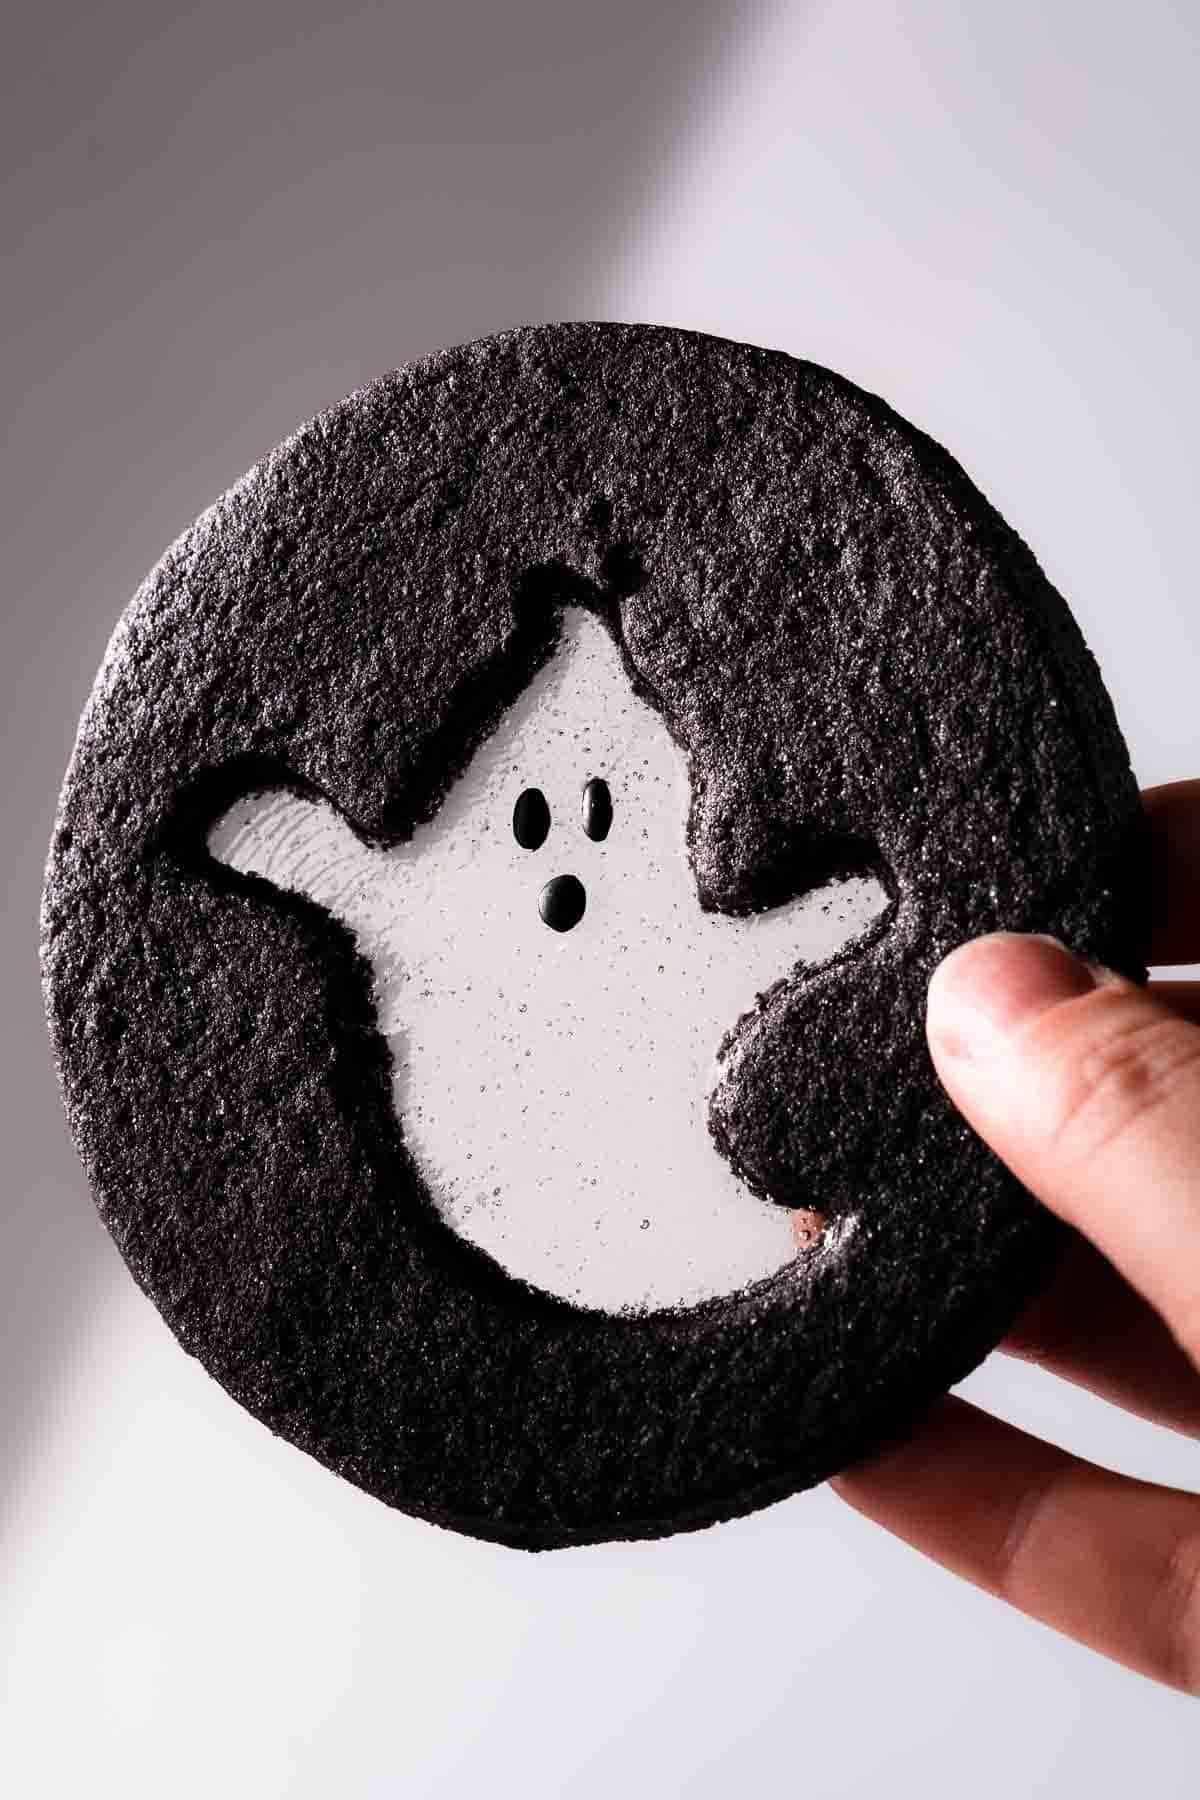 Halloween windowpane cookie with ghost design held in hand